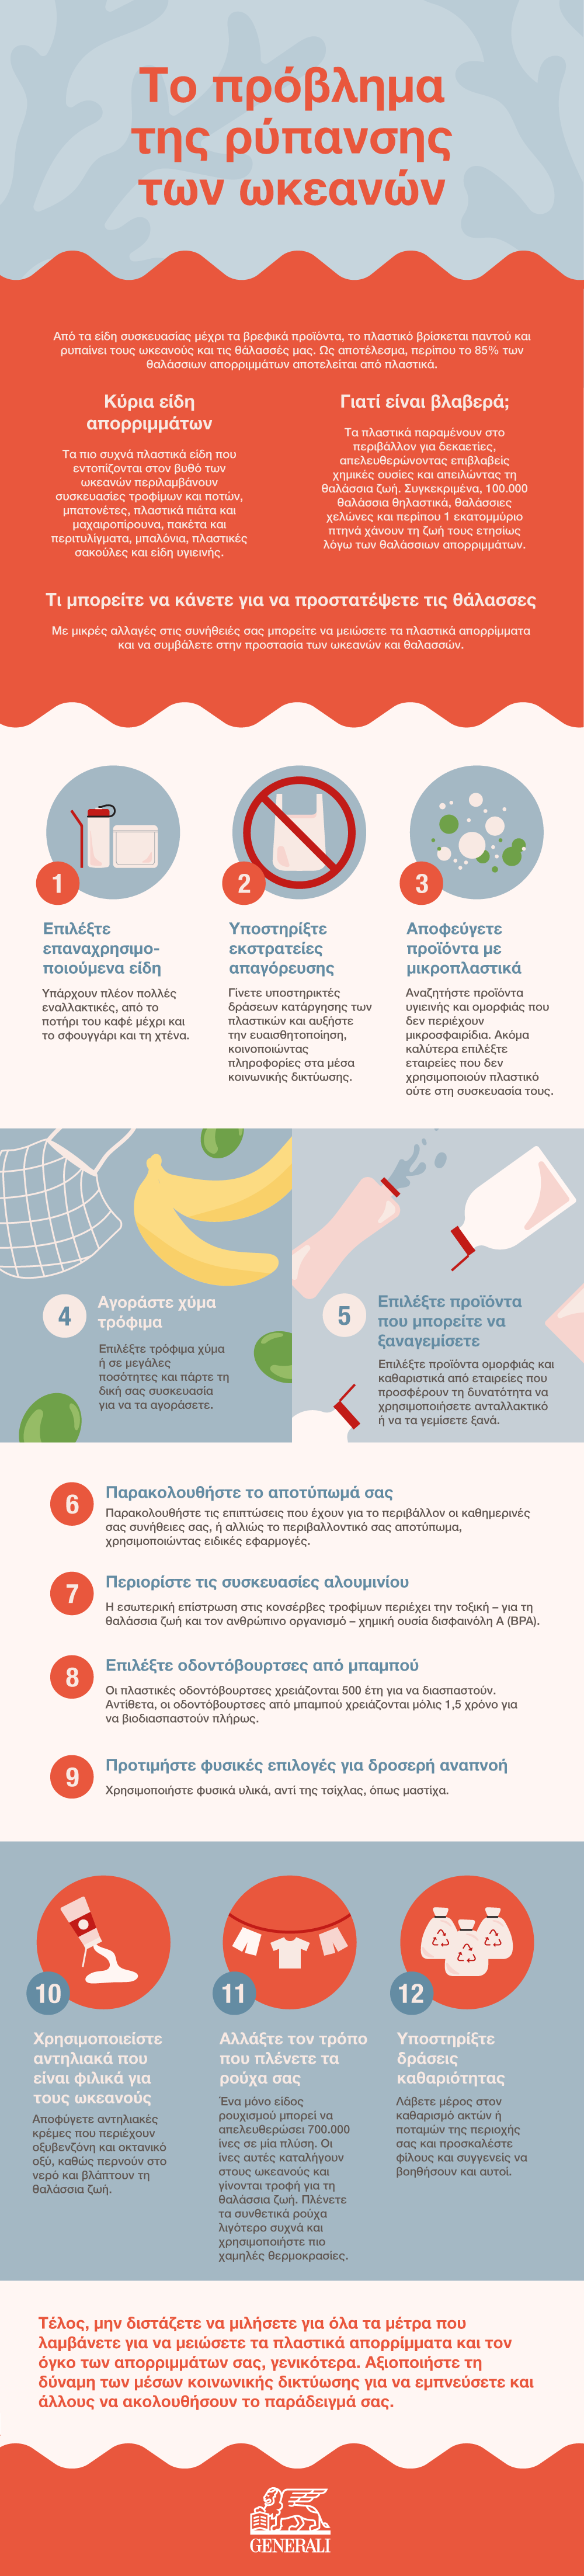 Generali_OceanPollution_Infographic_Greece (1).png